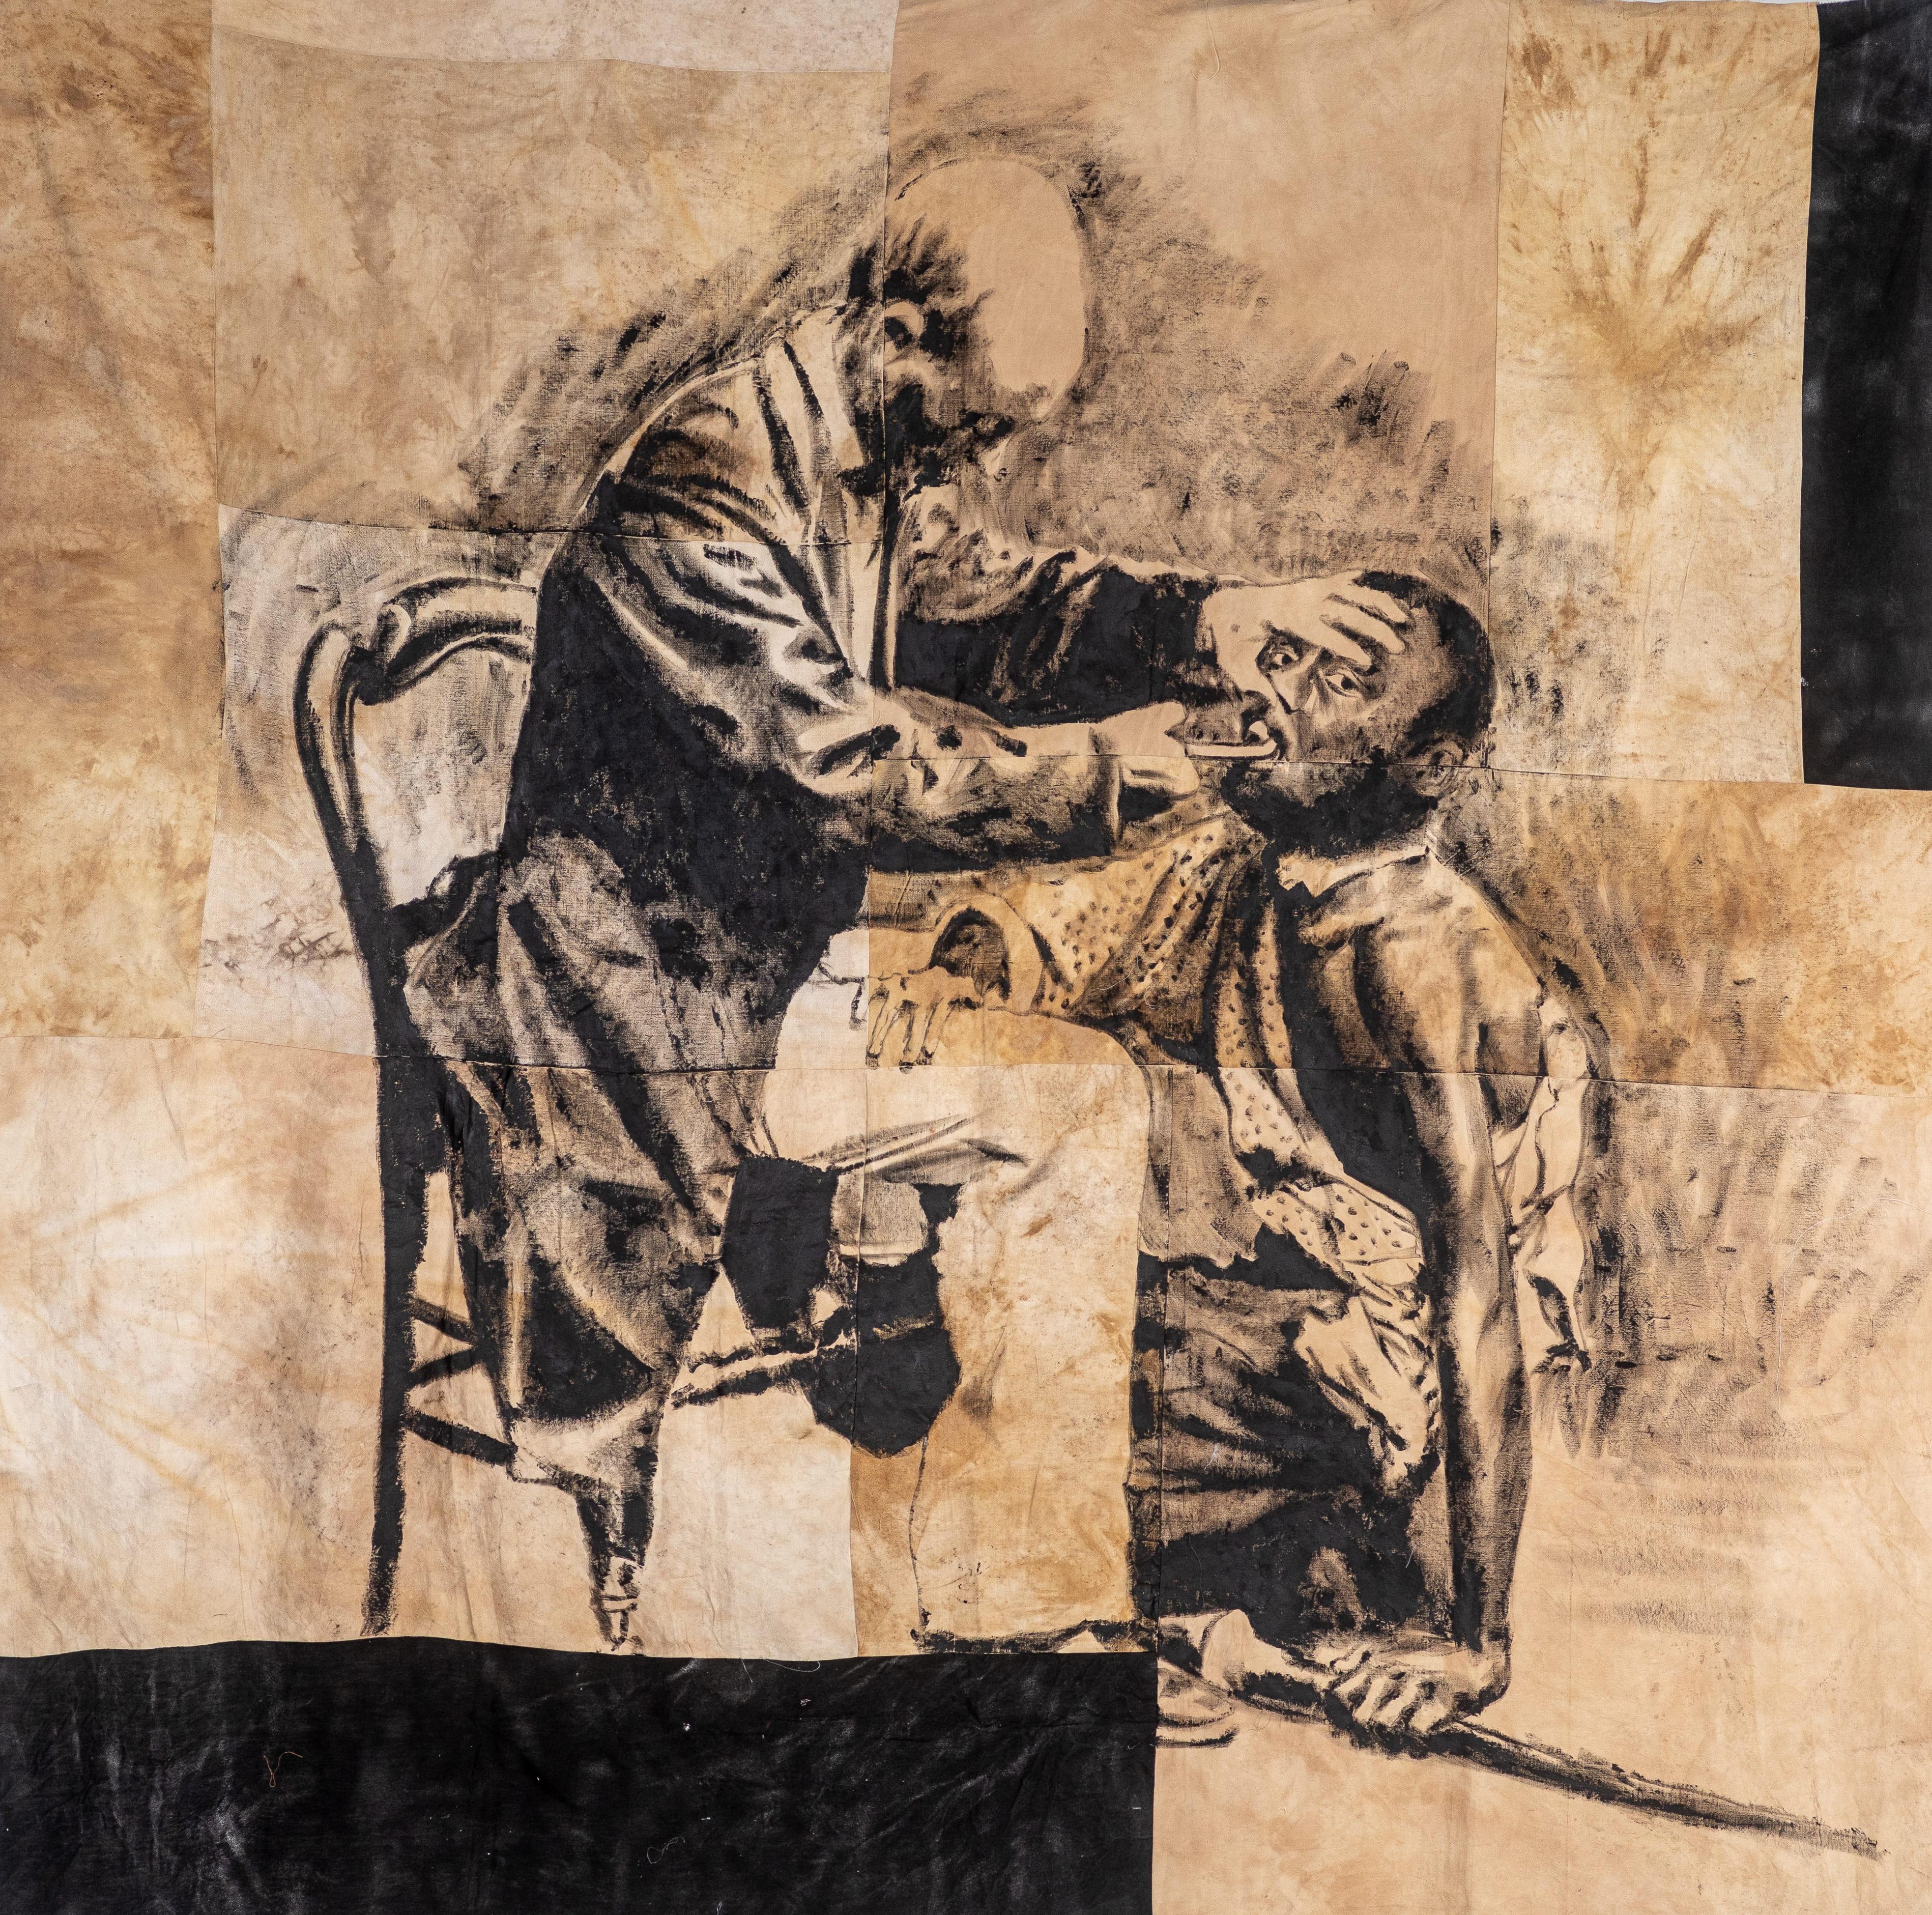 Galerie_Fakhoury - 13-09-2020 - HD - JPG (sRVB) (4 of 31)